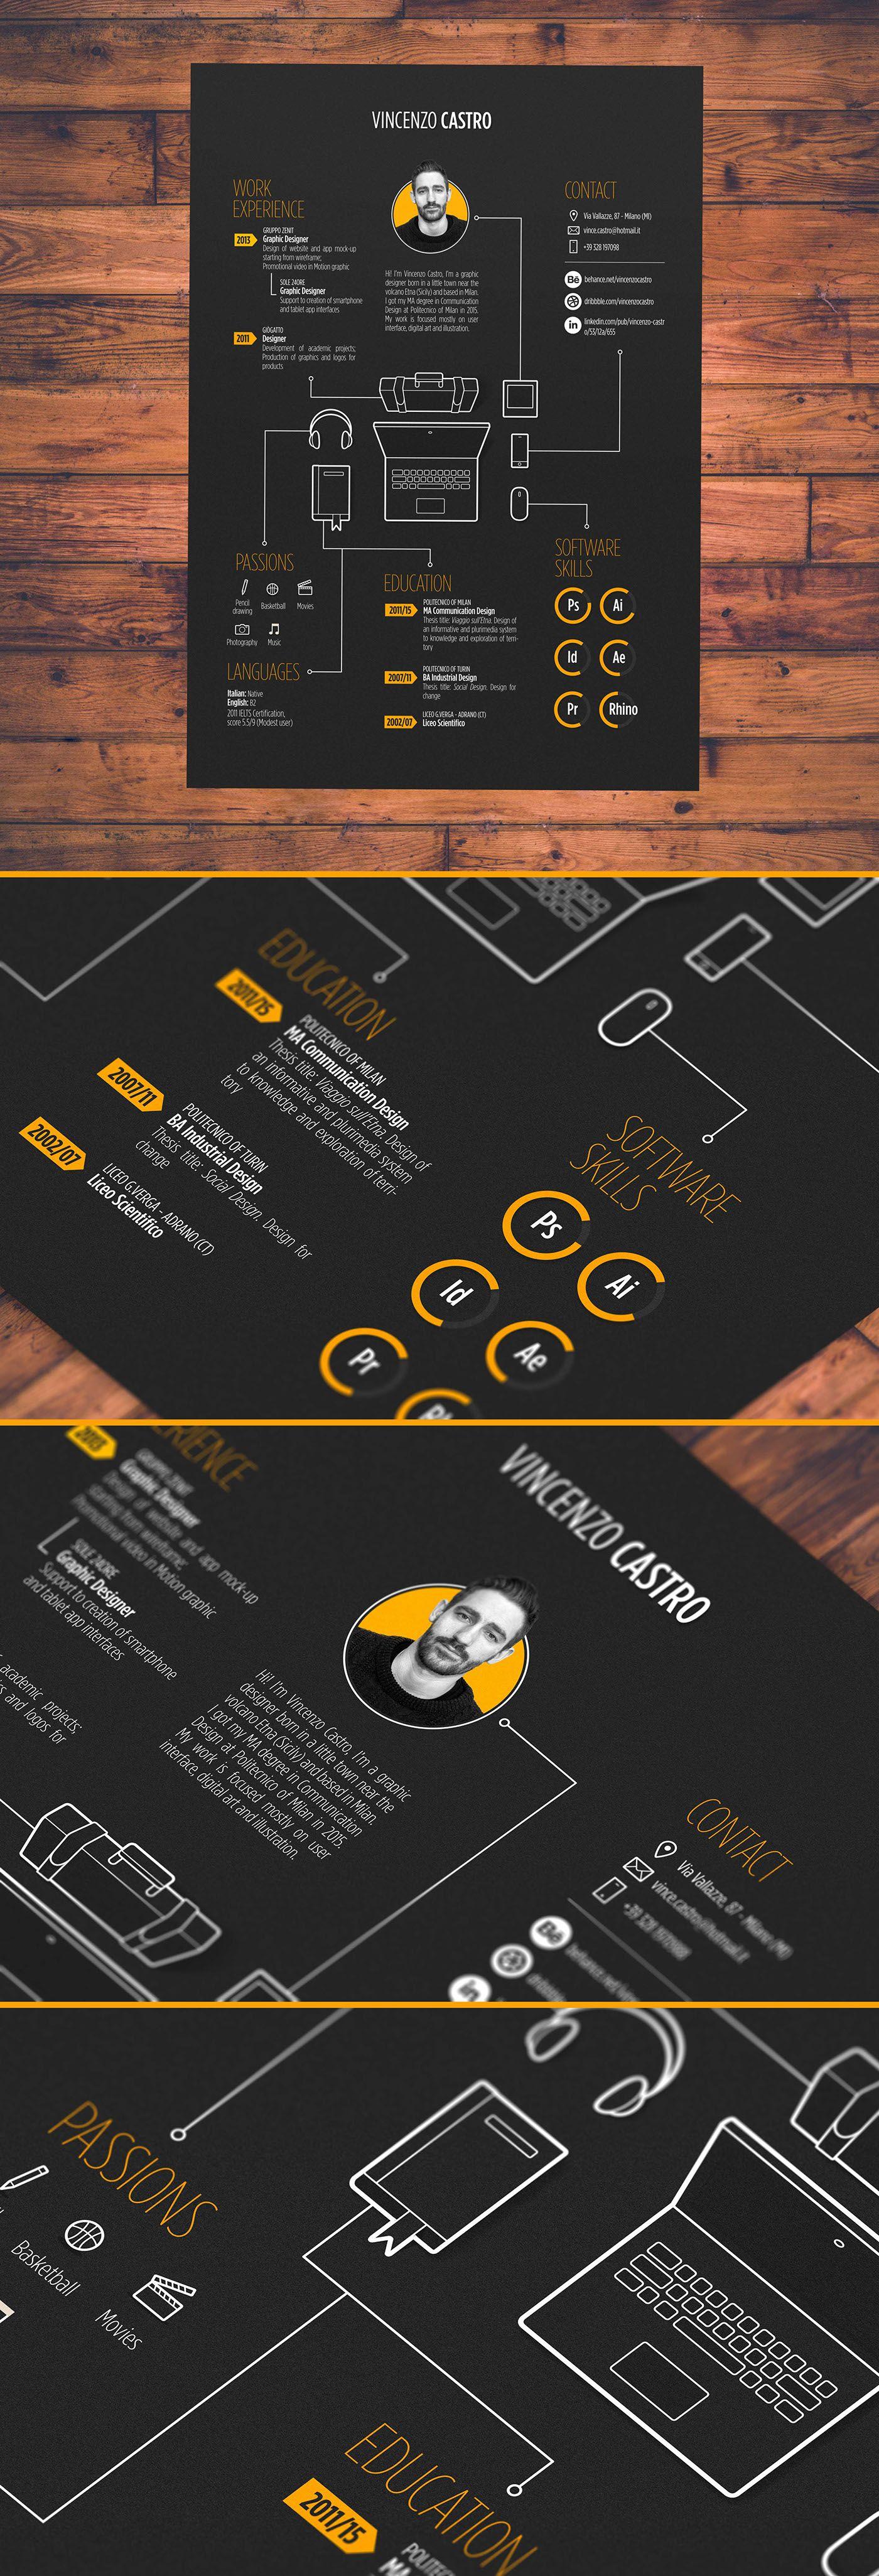 Curriculum Vitae By Vincenzo Castro Https Www Behance Net Gallery 26611697 Curriculum Vitae Cv Resume Graphic Design Resume Graphic Design Cv Creative Cv